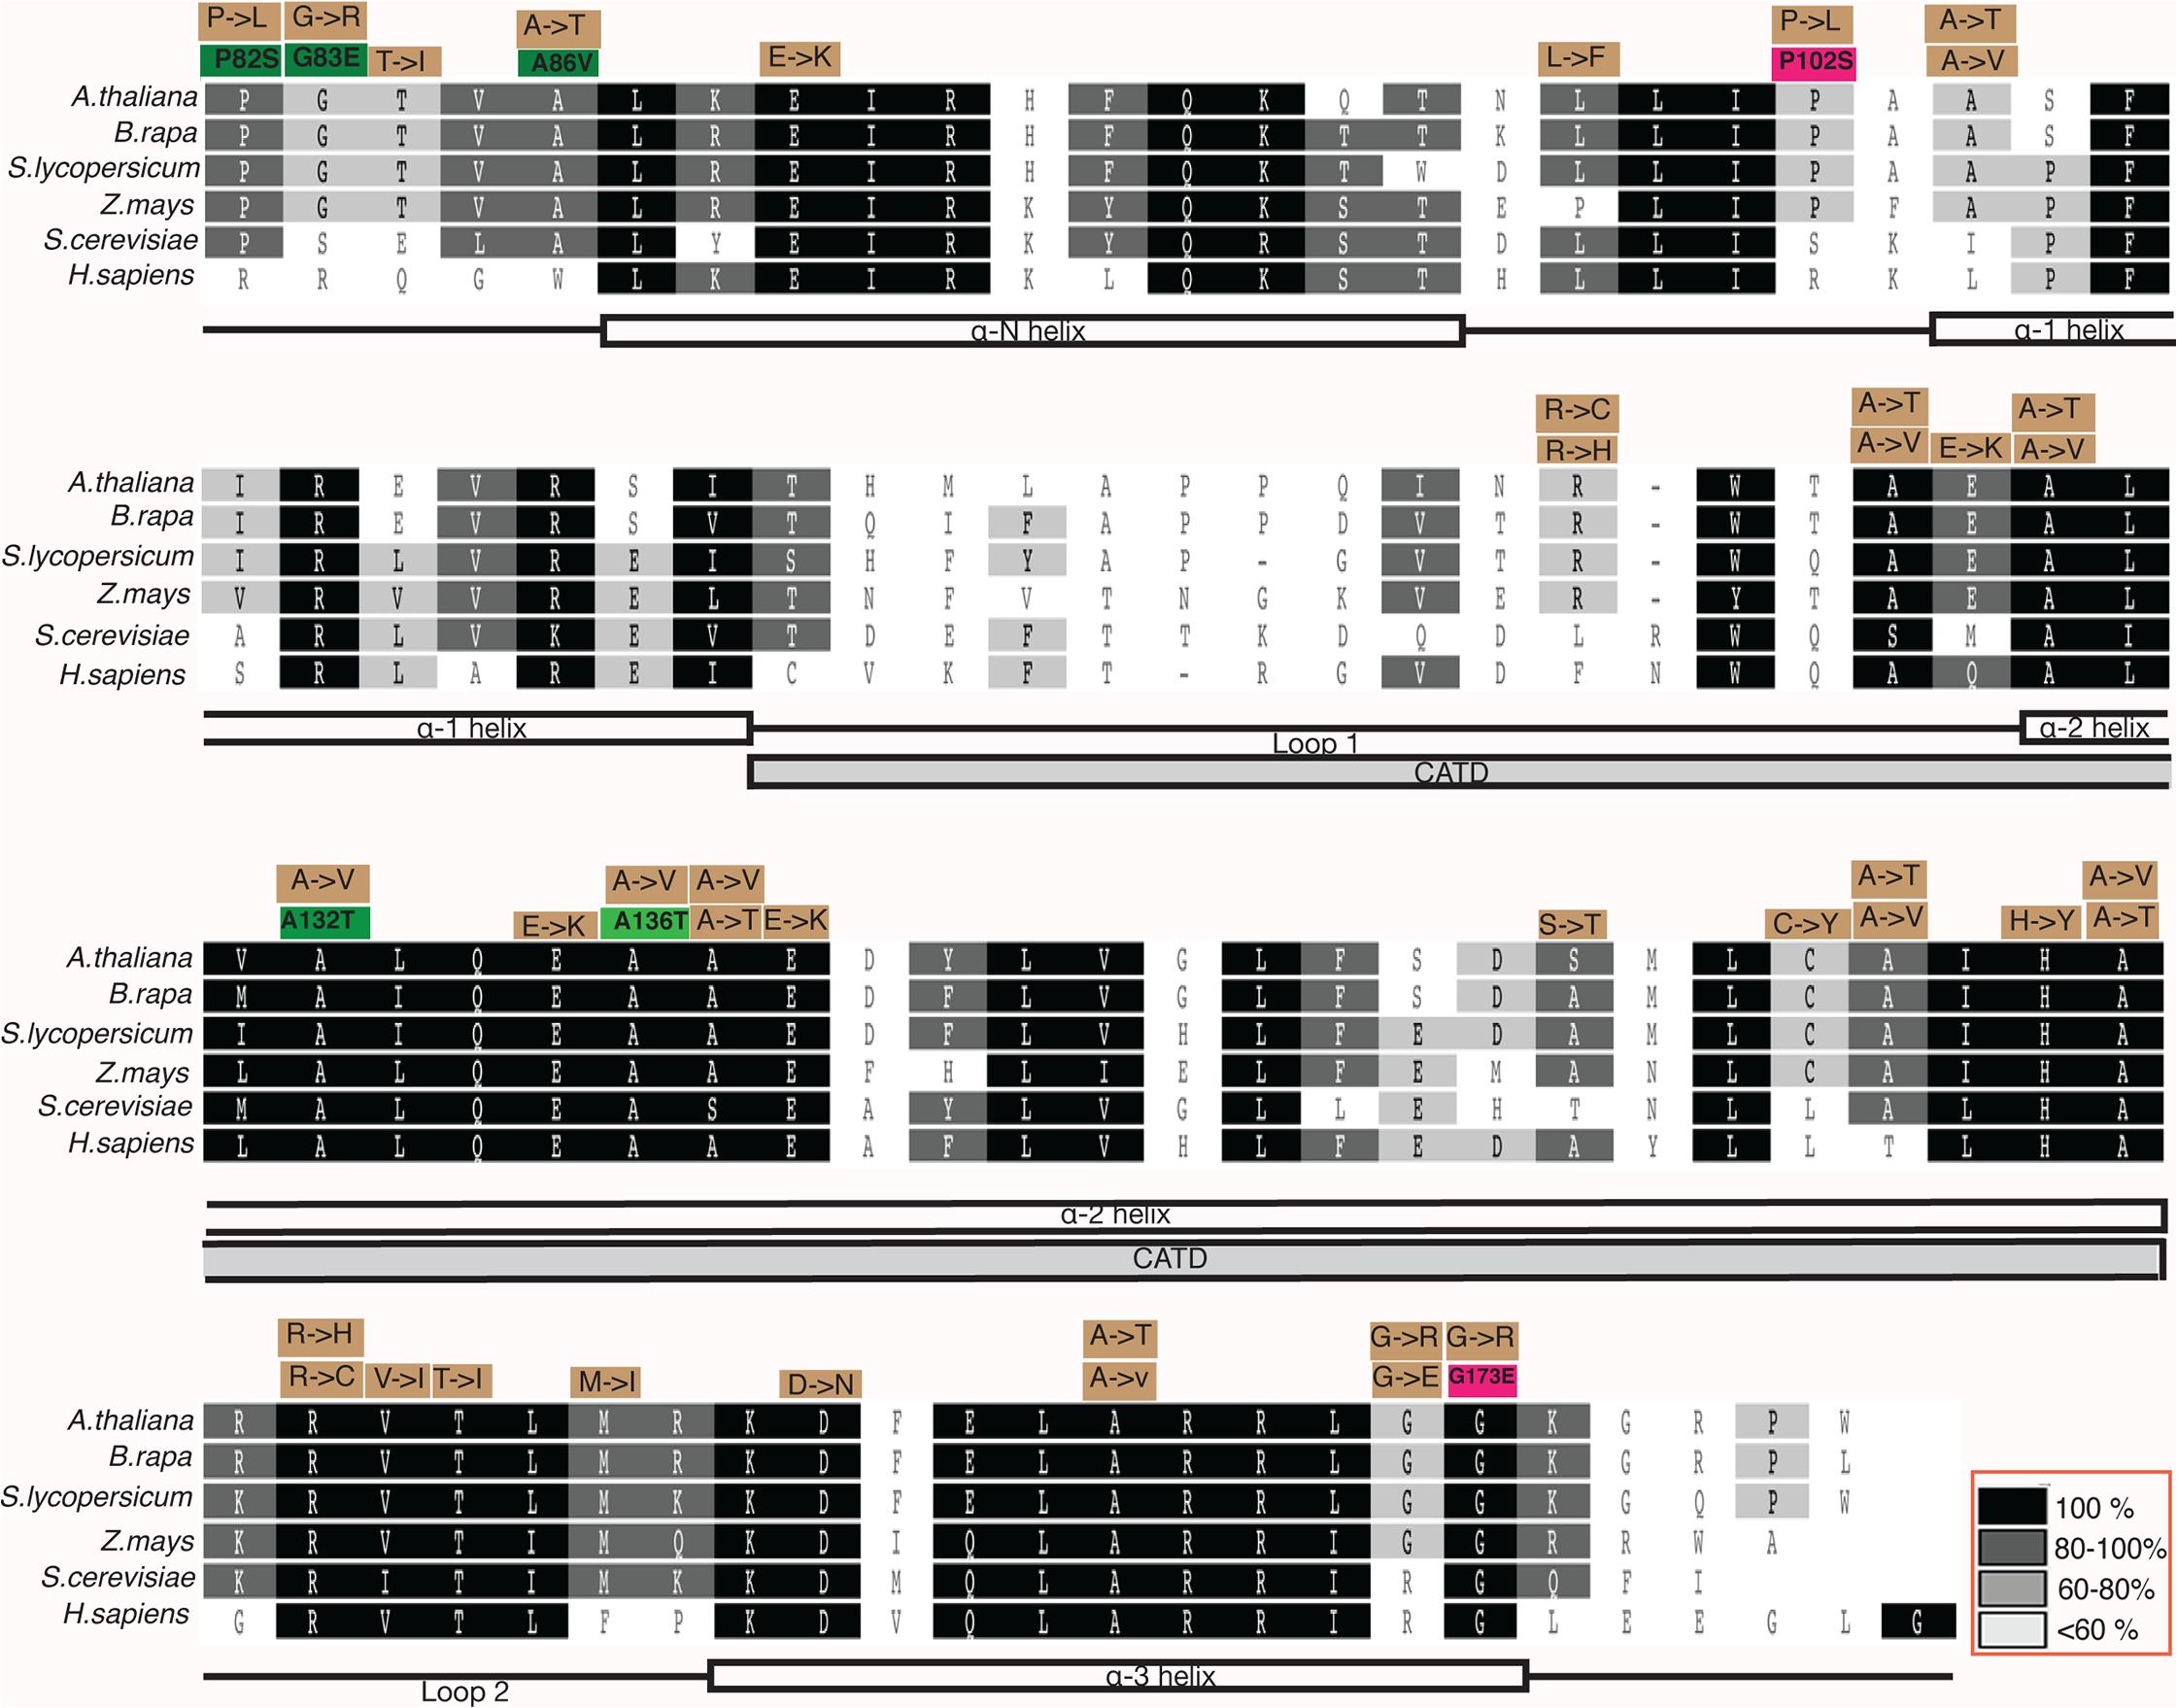 Multiple sequence alignment of CENH3 Histone Fold Domain (HFD) of <i>Arabidopsis thaliana</i>, <i>Brassica rapa</i>, <i>Solanum lycopersicum</i>, <i>Zea mays</i>, <i>Saccharomyces cerevisiae</i> and <i>Homo sapiens</i>.